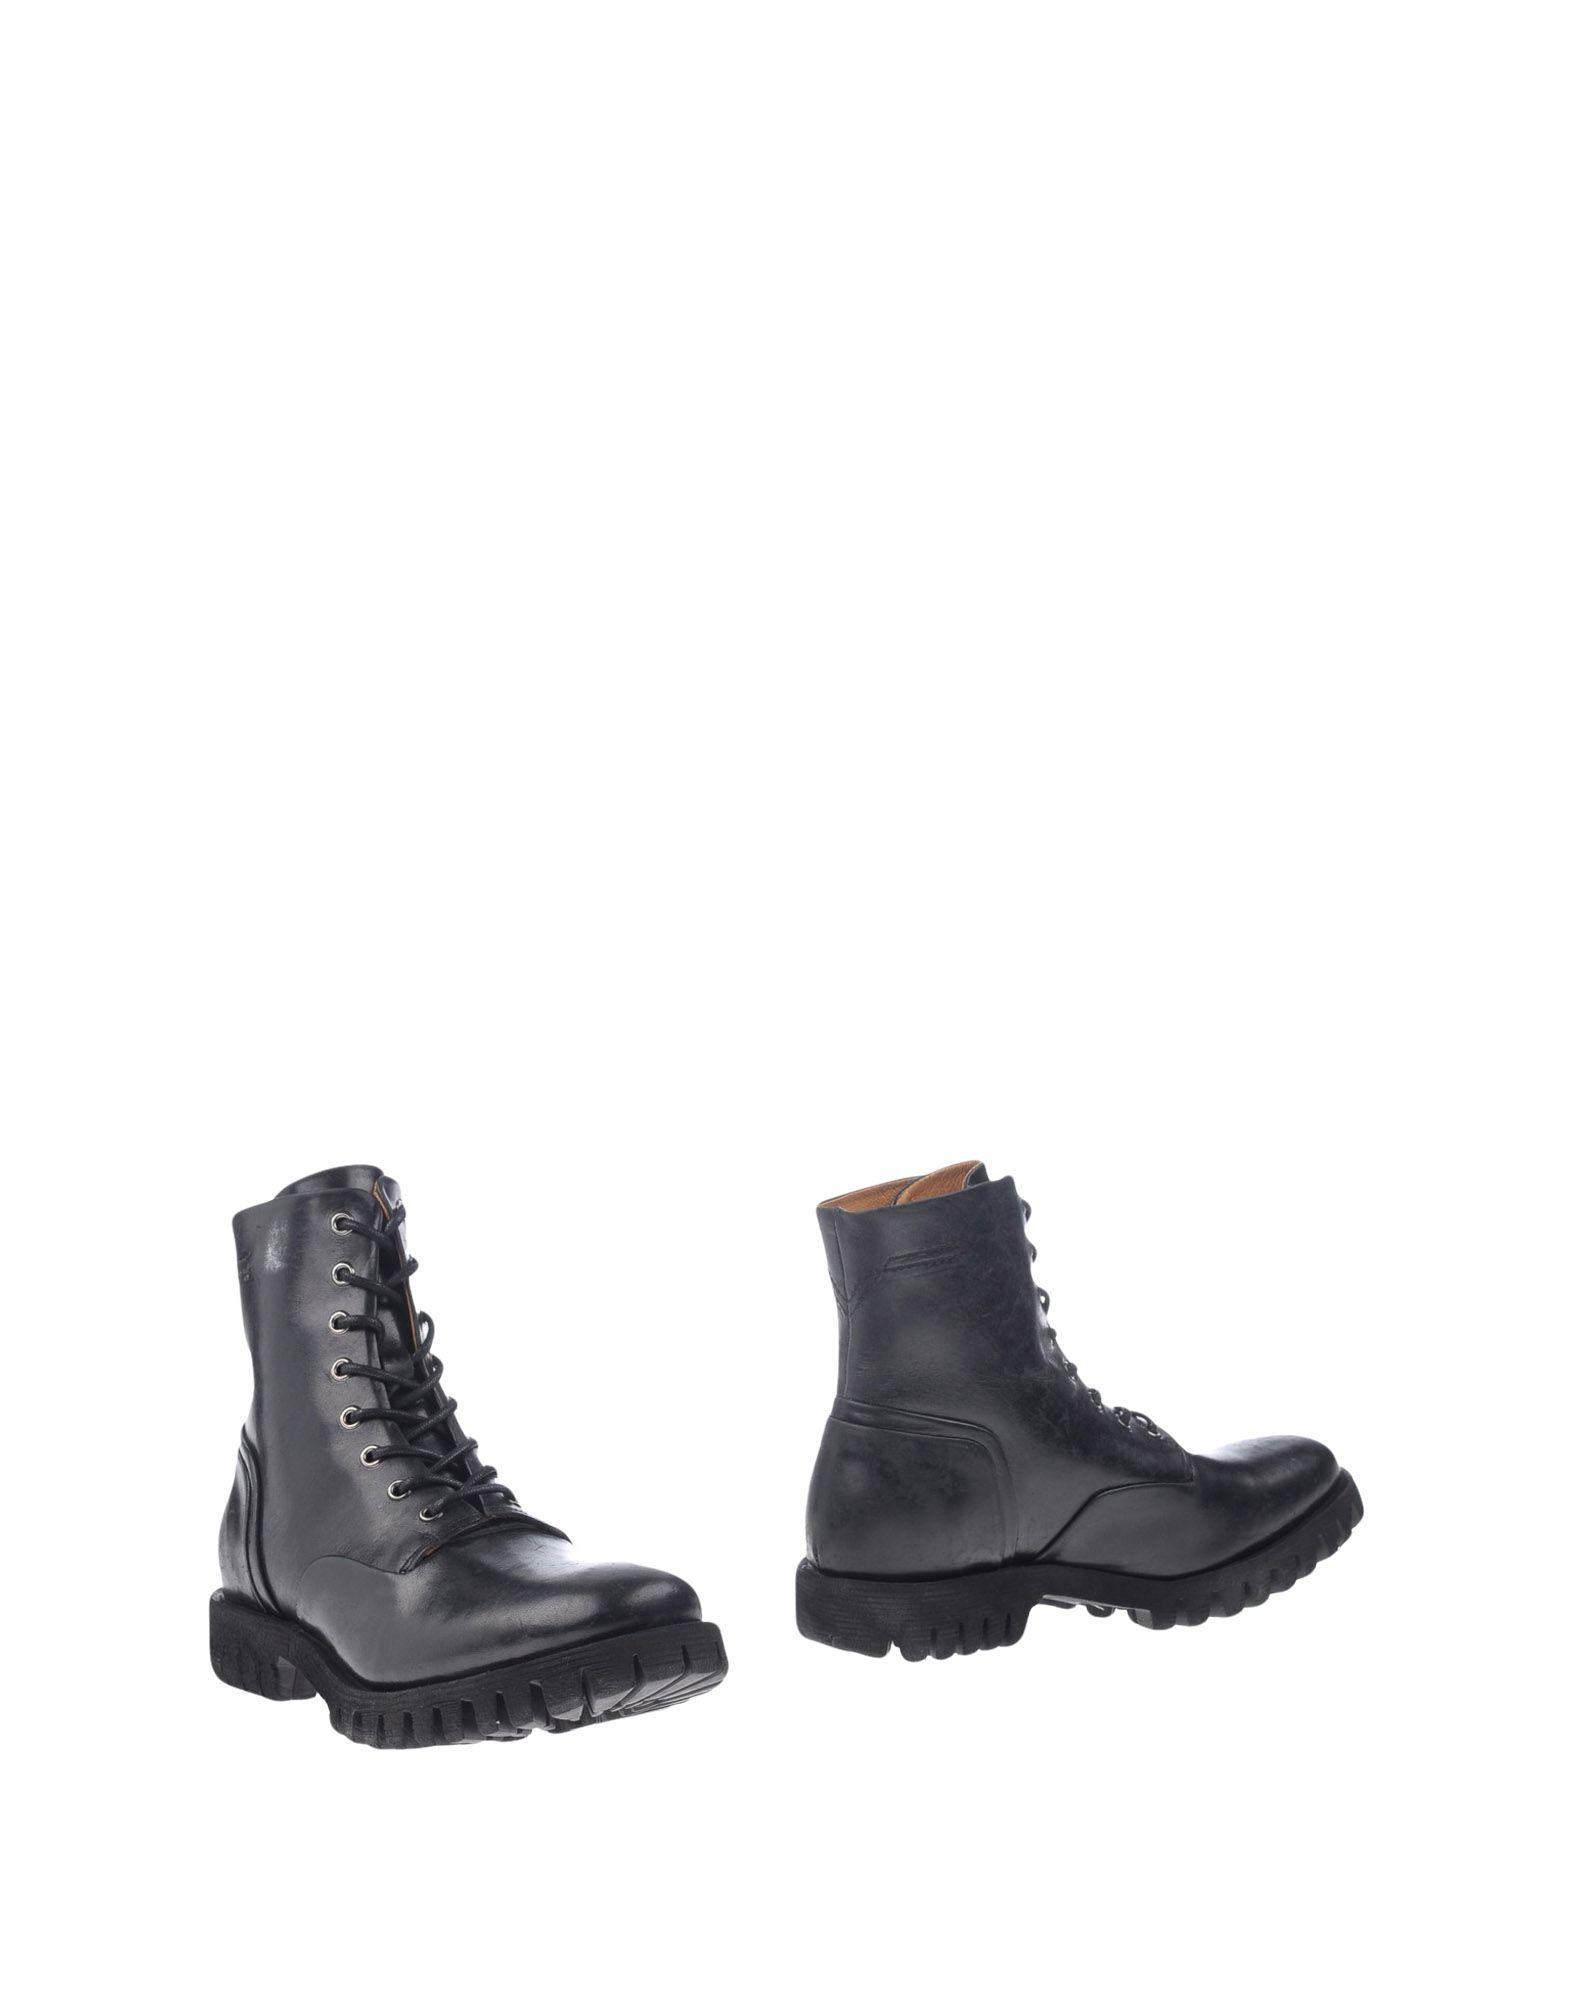 DIESEL Полусапоги и высокие ботинки magazzini del sale полусапоги и высокие ботинки